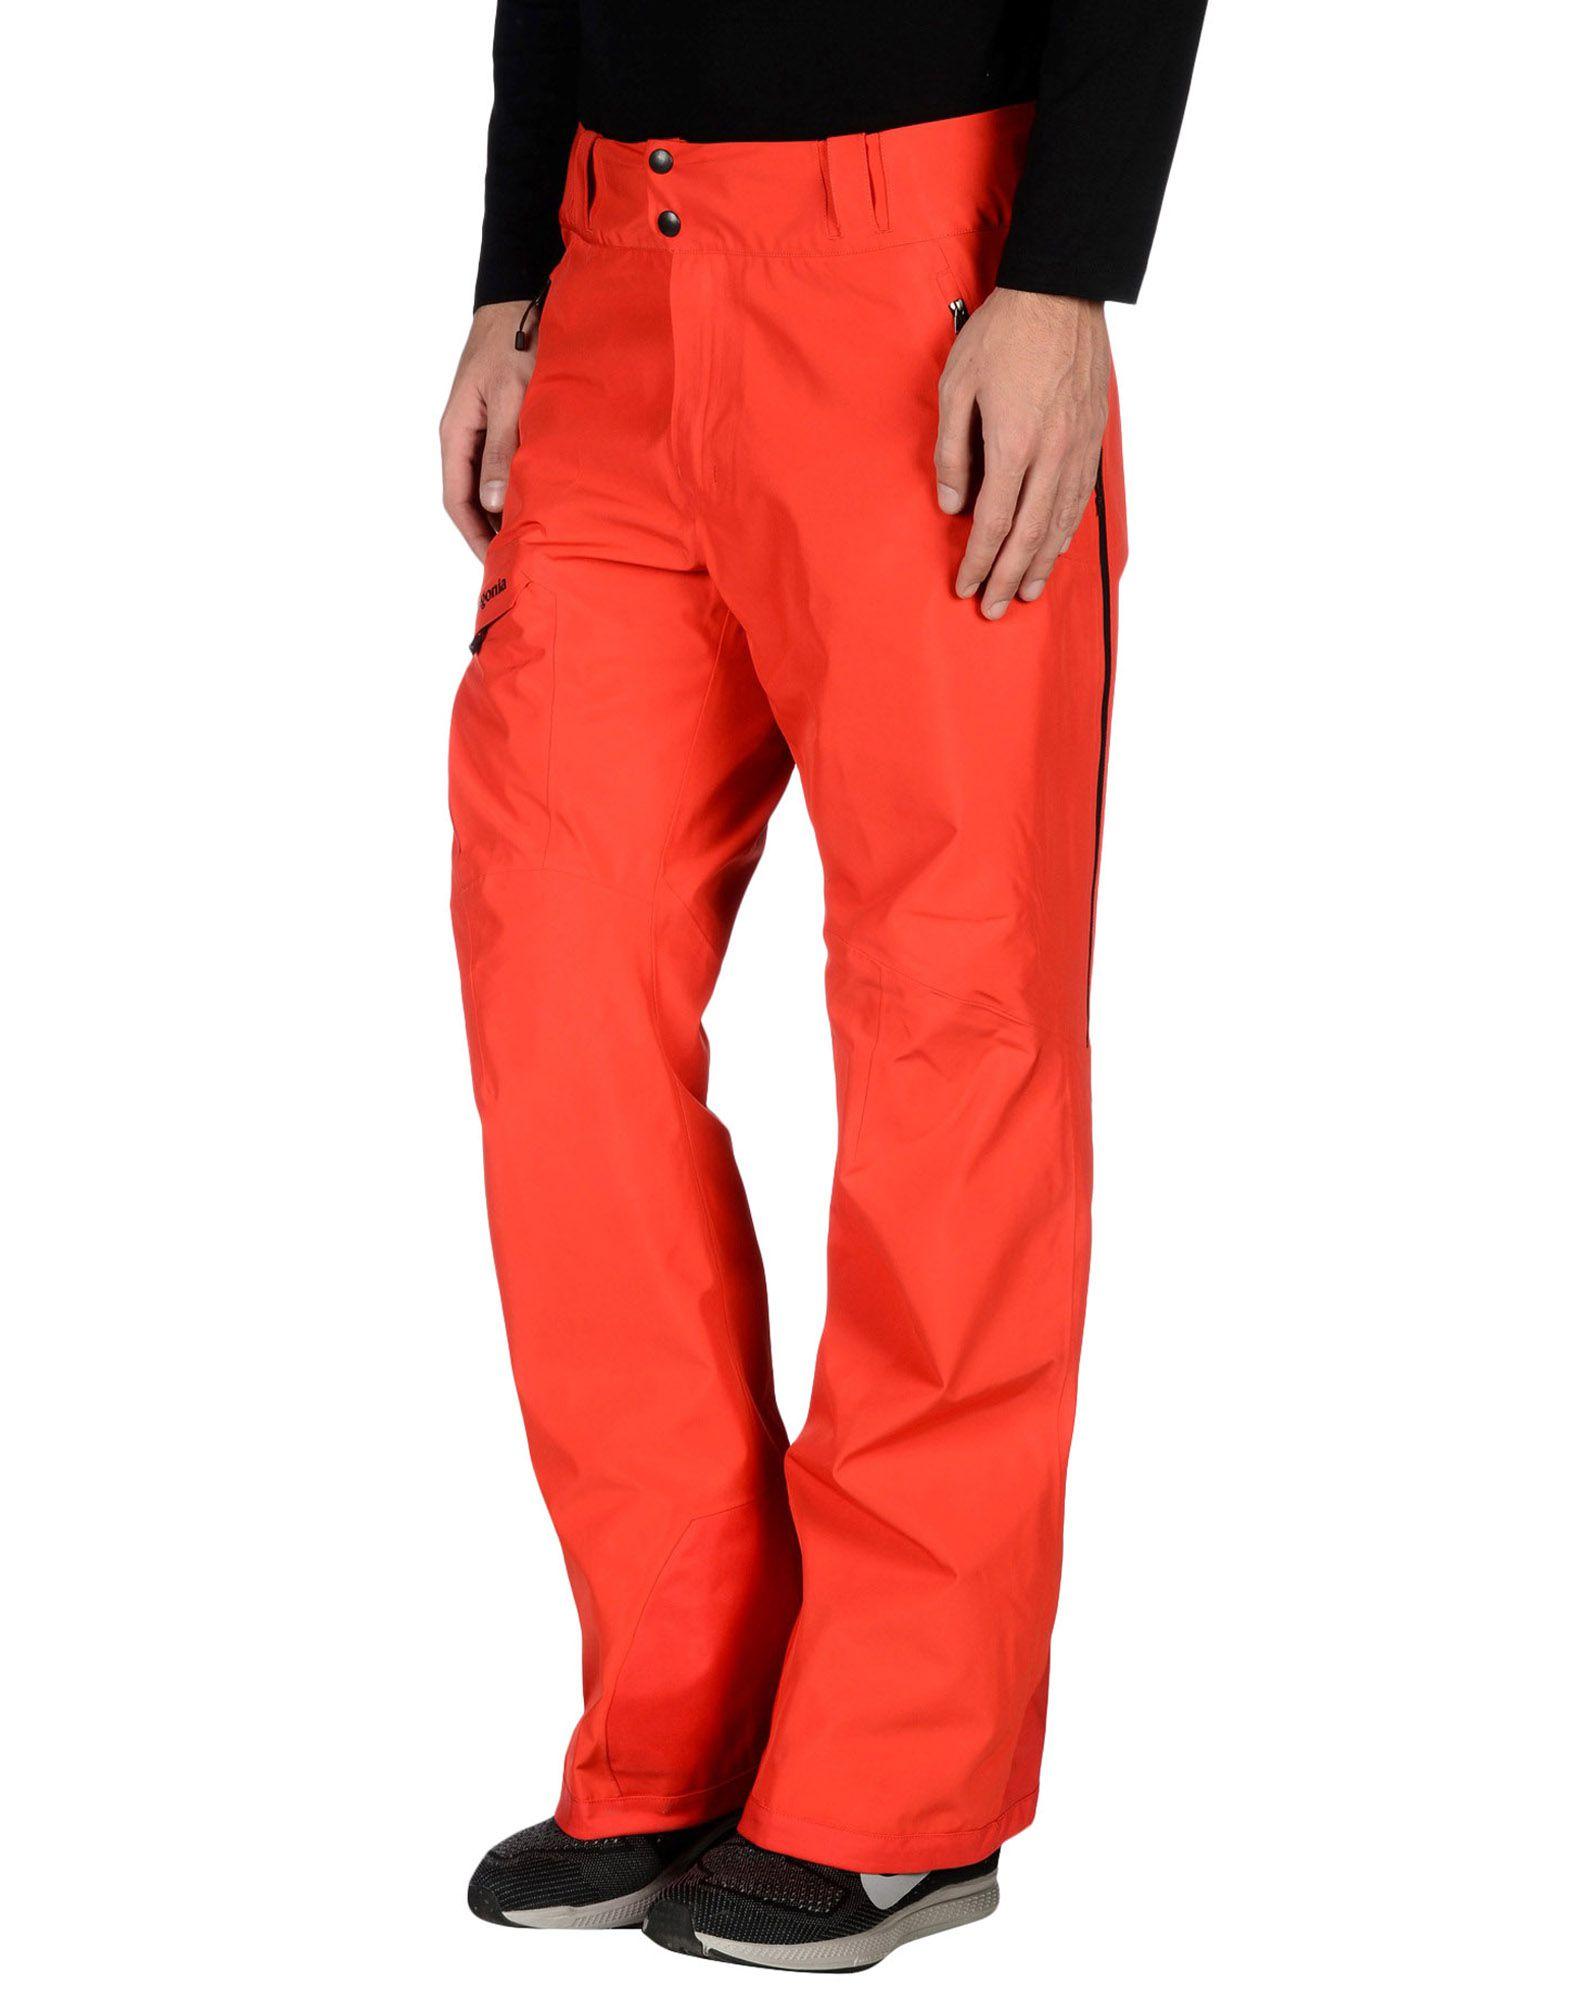 Pantalone Sportivo Patagonia Powder Bowl Pants Goretex - Uomo - Acquista online su